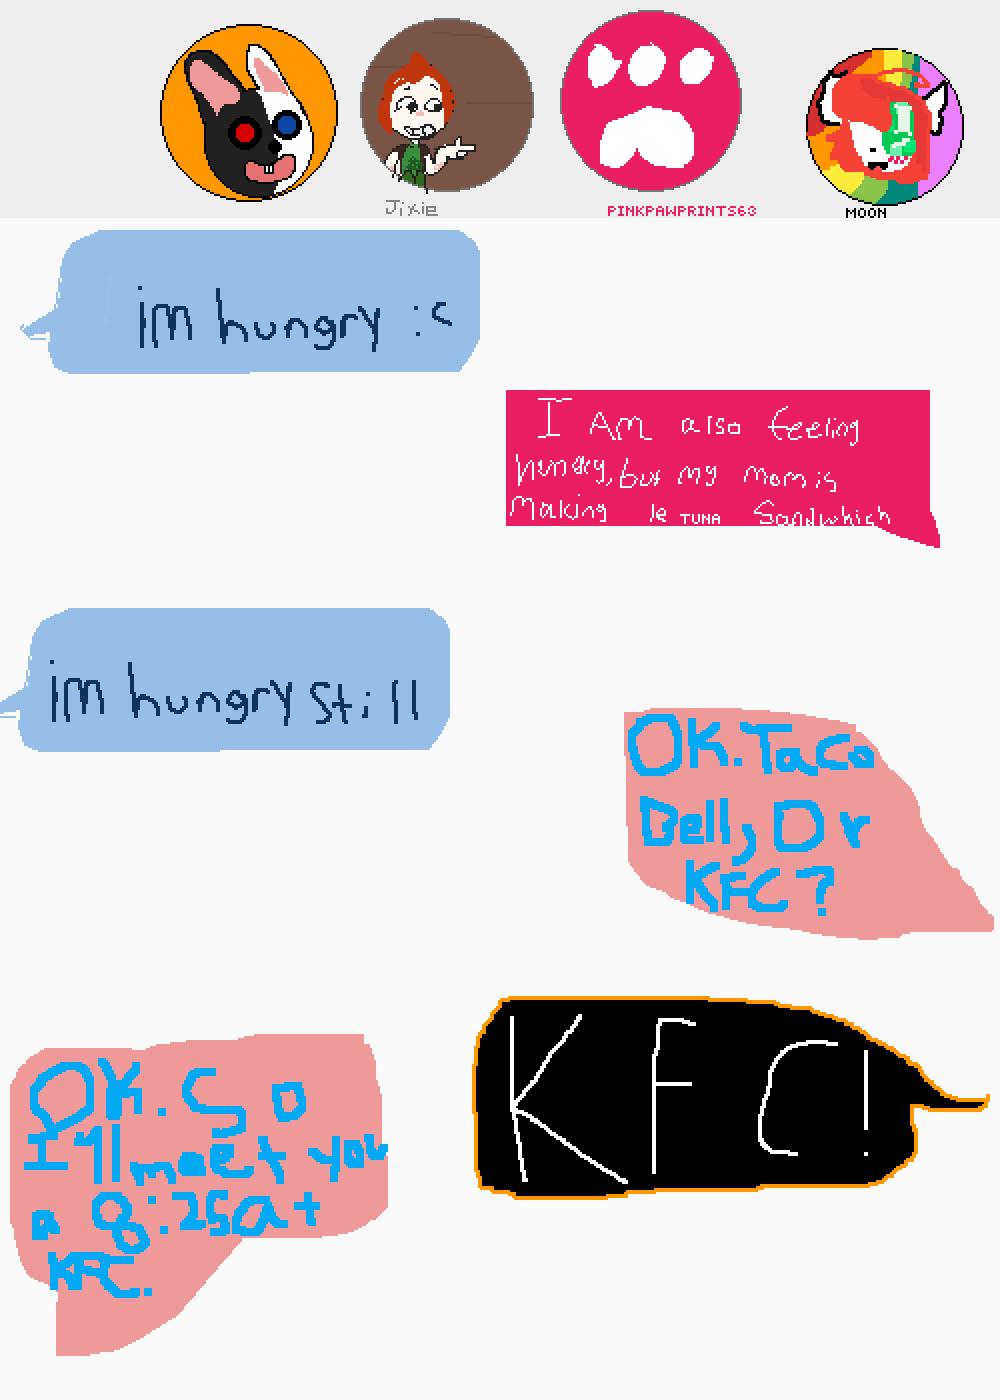 our vote for KFC won! by DakotaChase15